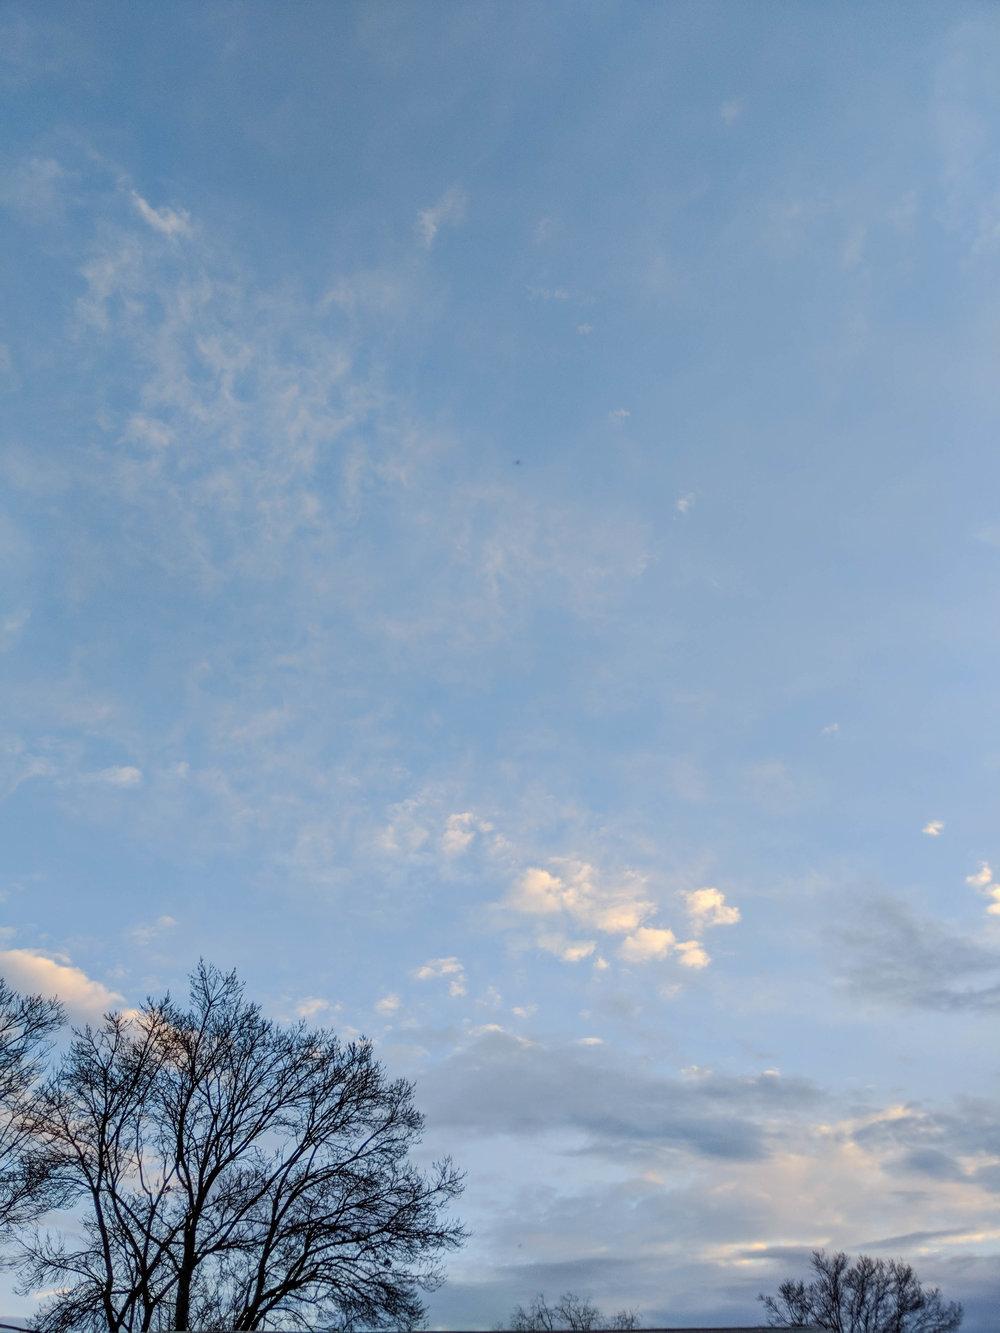 bri rinehart; photography; hanford; california; sky